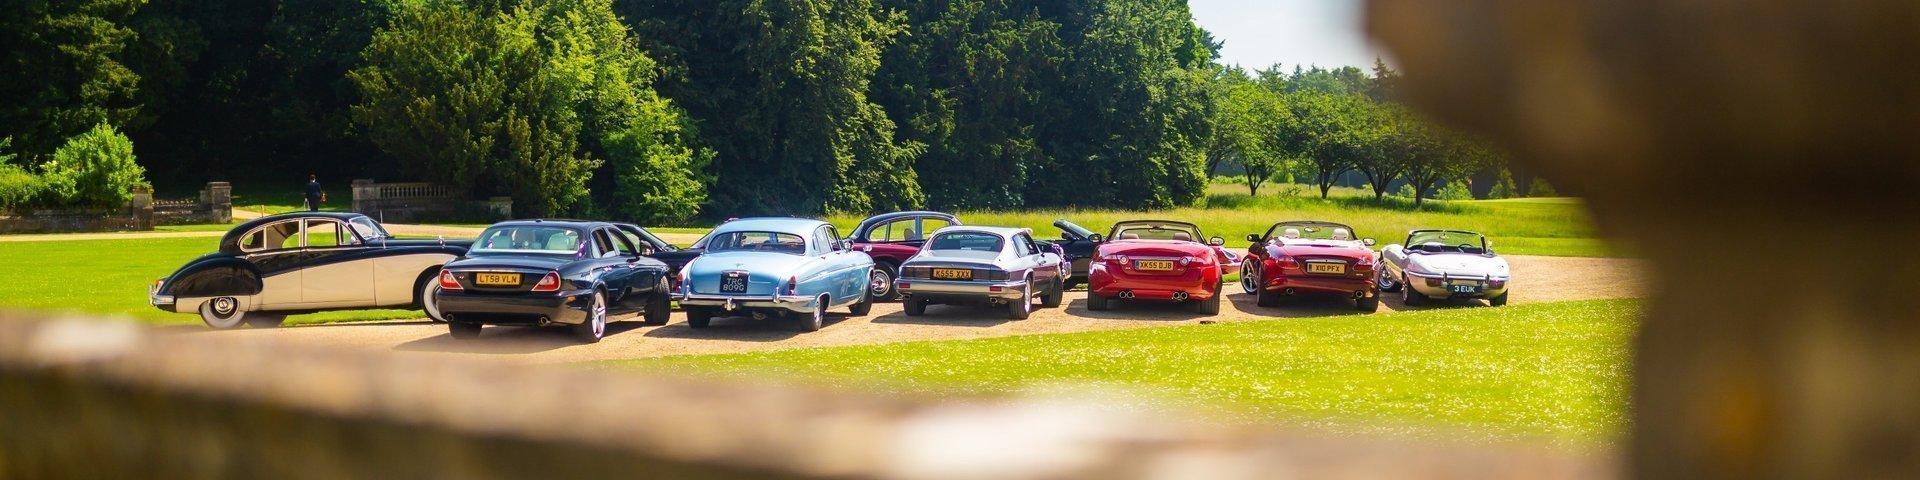 The Jaguar Festival 2019 - Heythorp Park